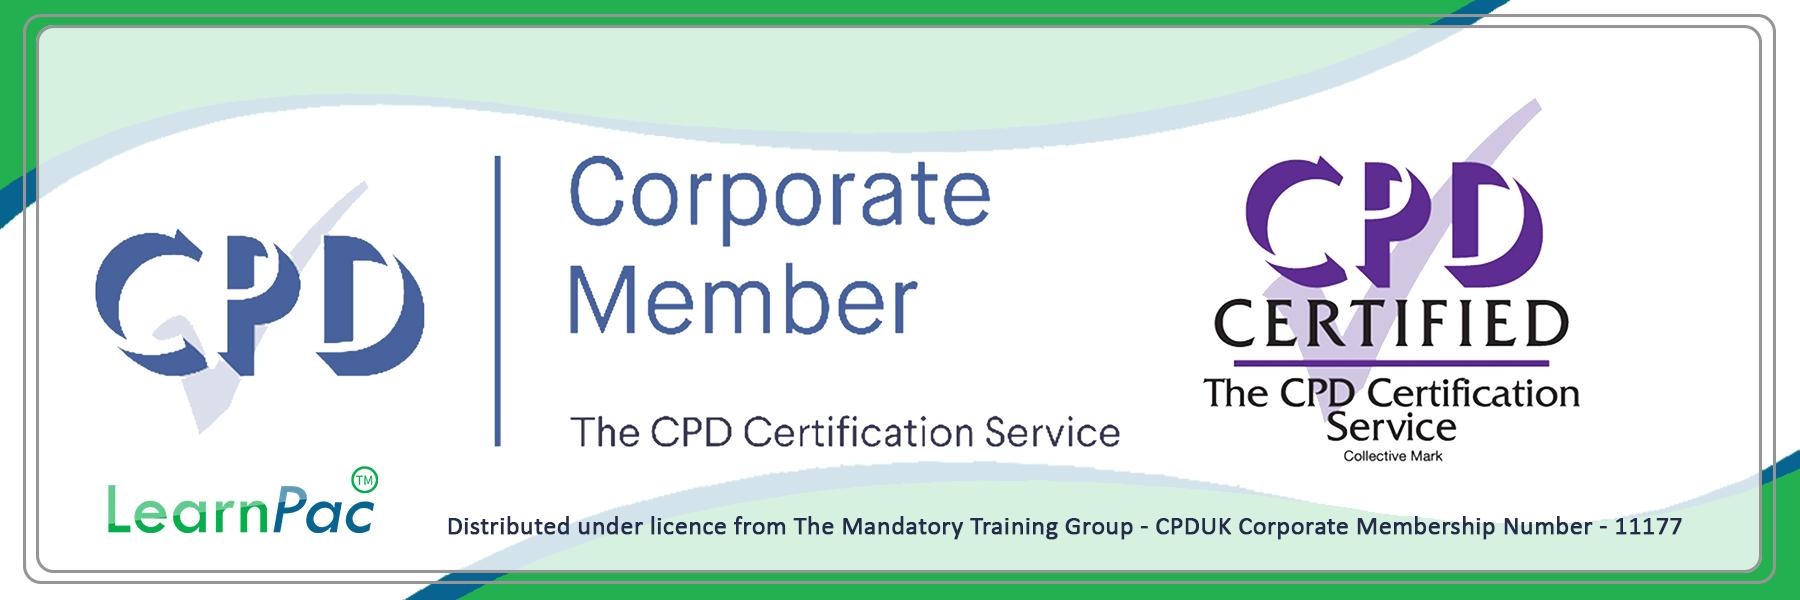 Care Certificate Standard 1 - CPDUK Certified - Learnpac System UK -